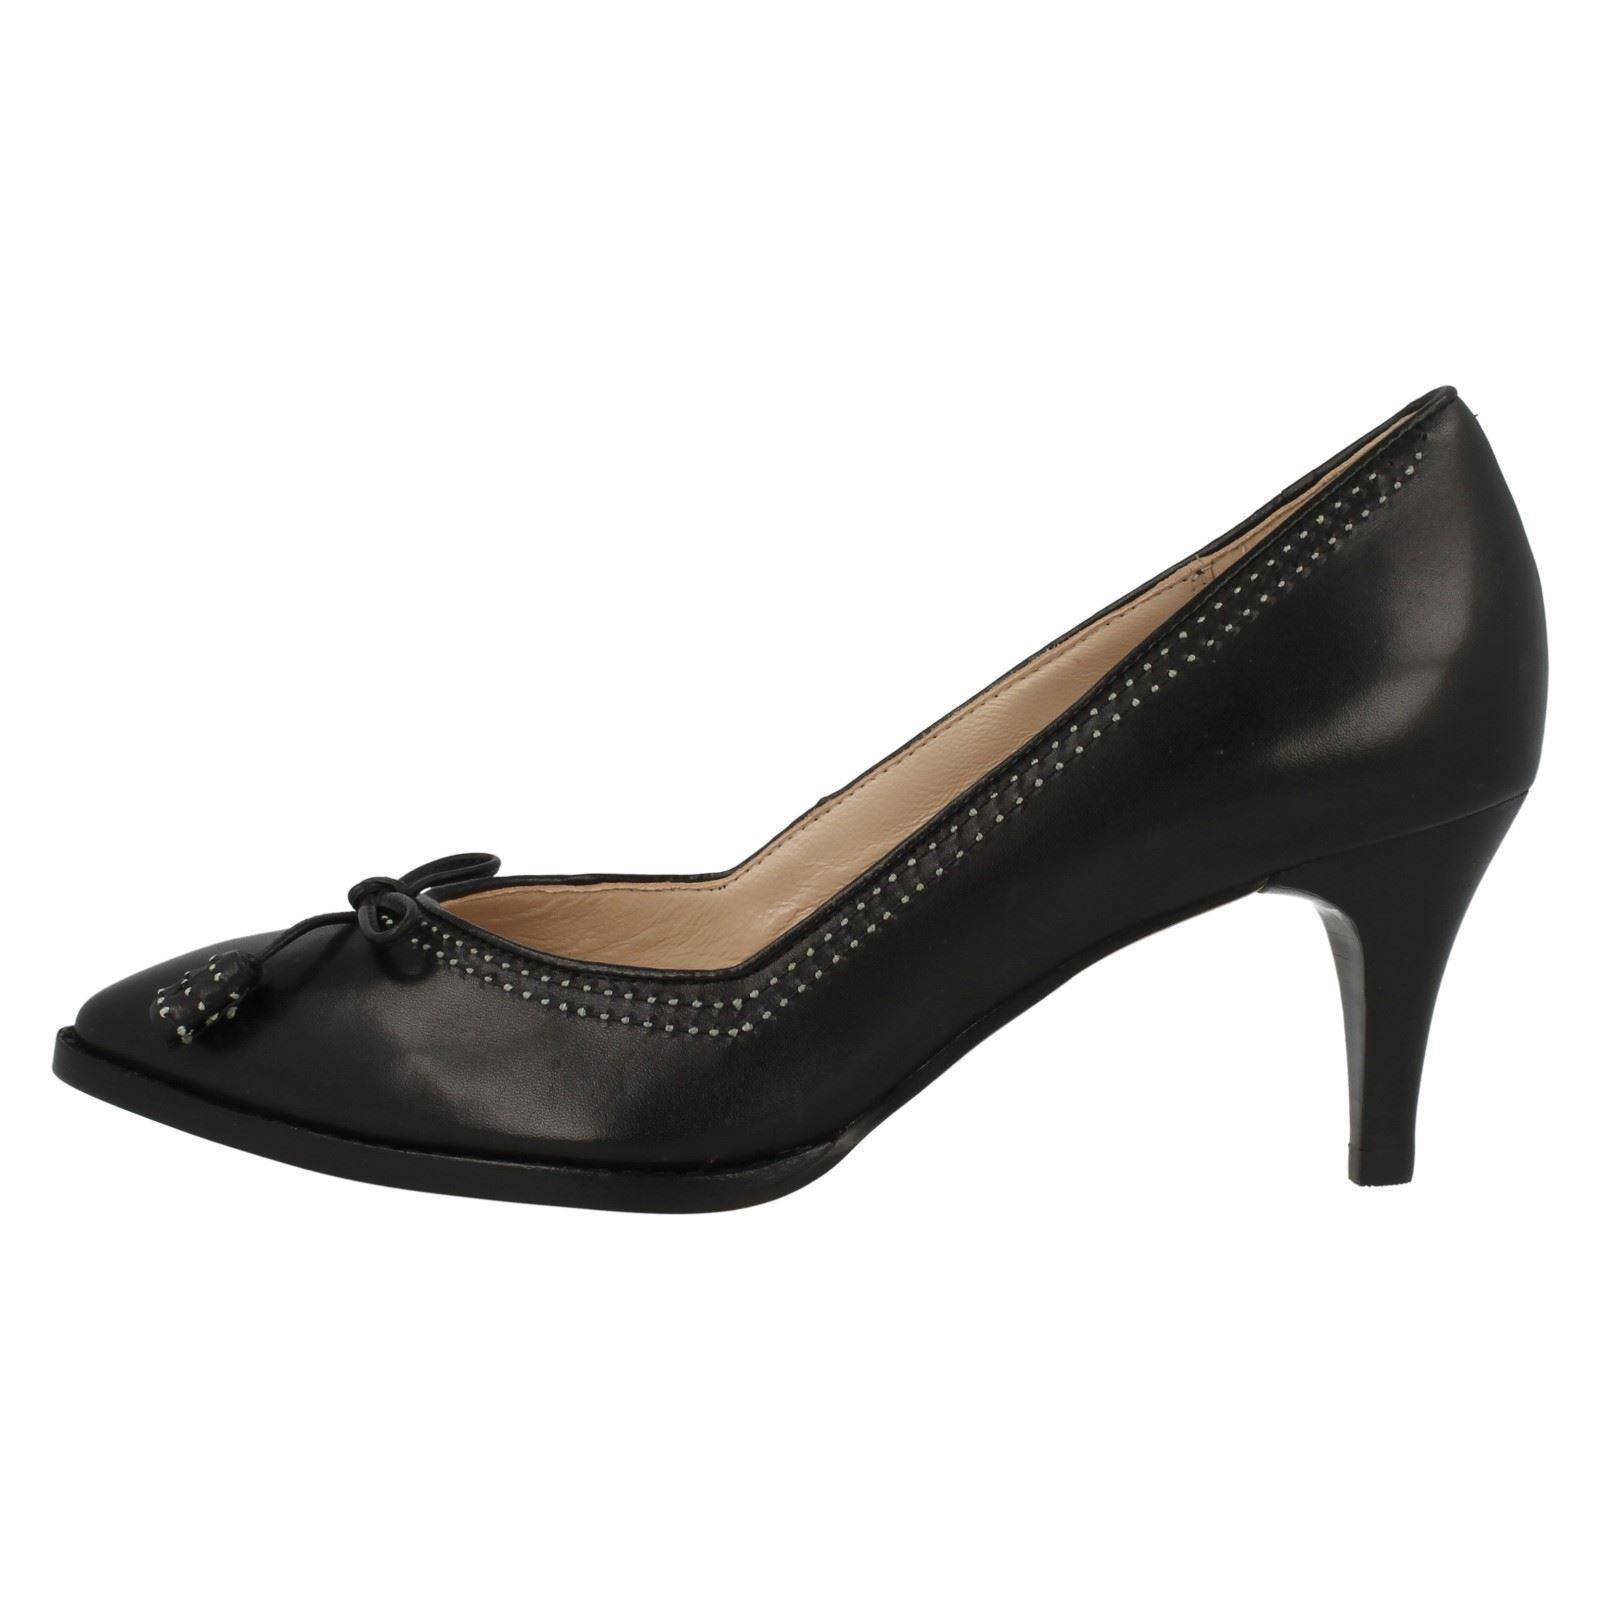 Damen Clarks Schuhe Antike Bombay Bombay Bombay b4ea8f